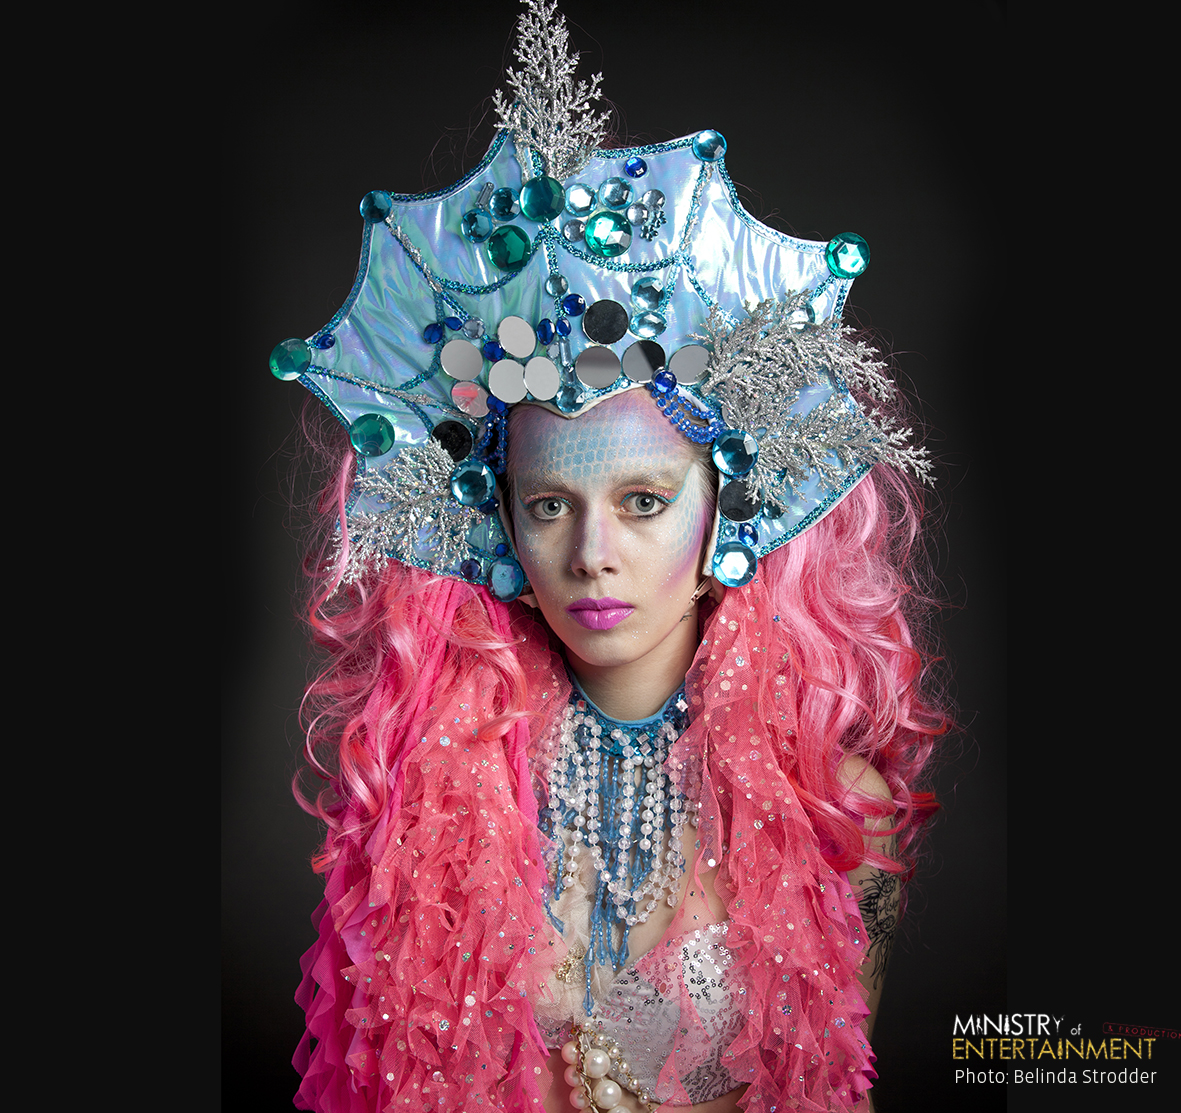 Ministry of Entertainment - Mermaid.jpg